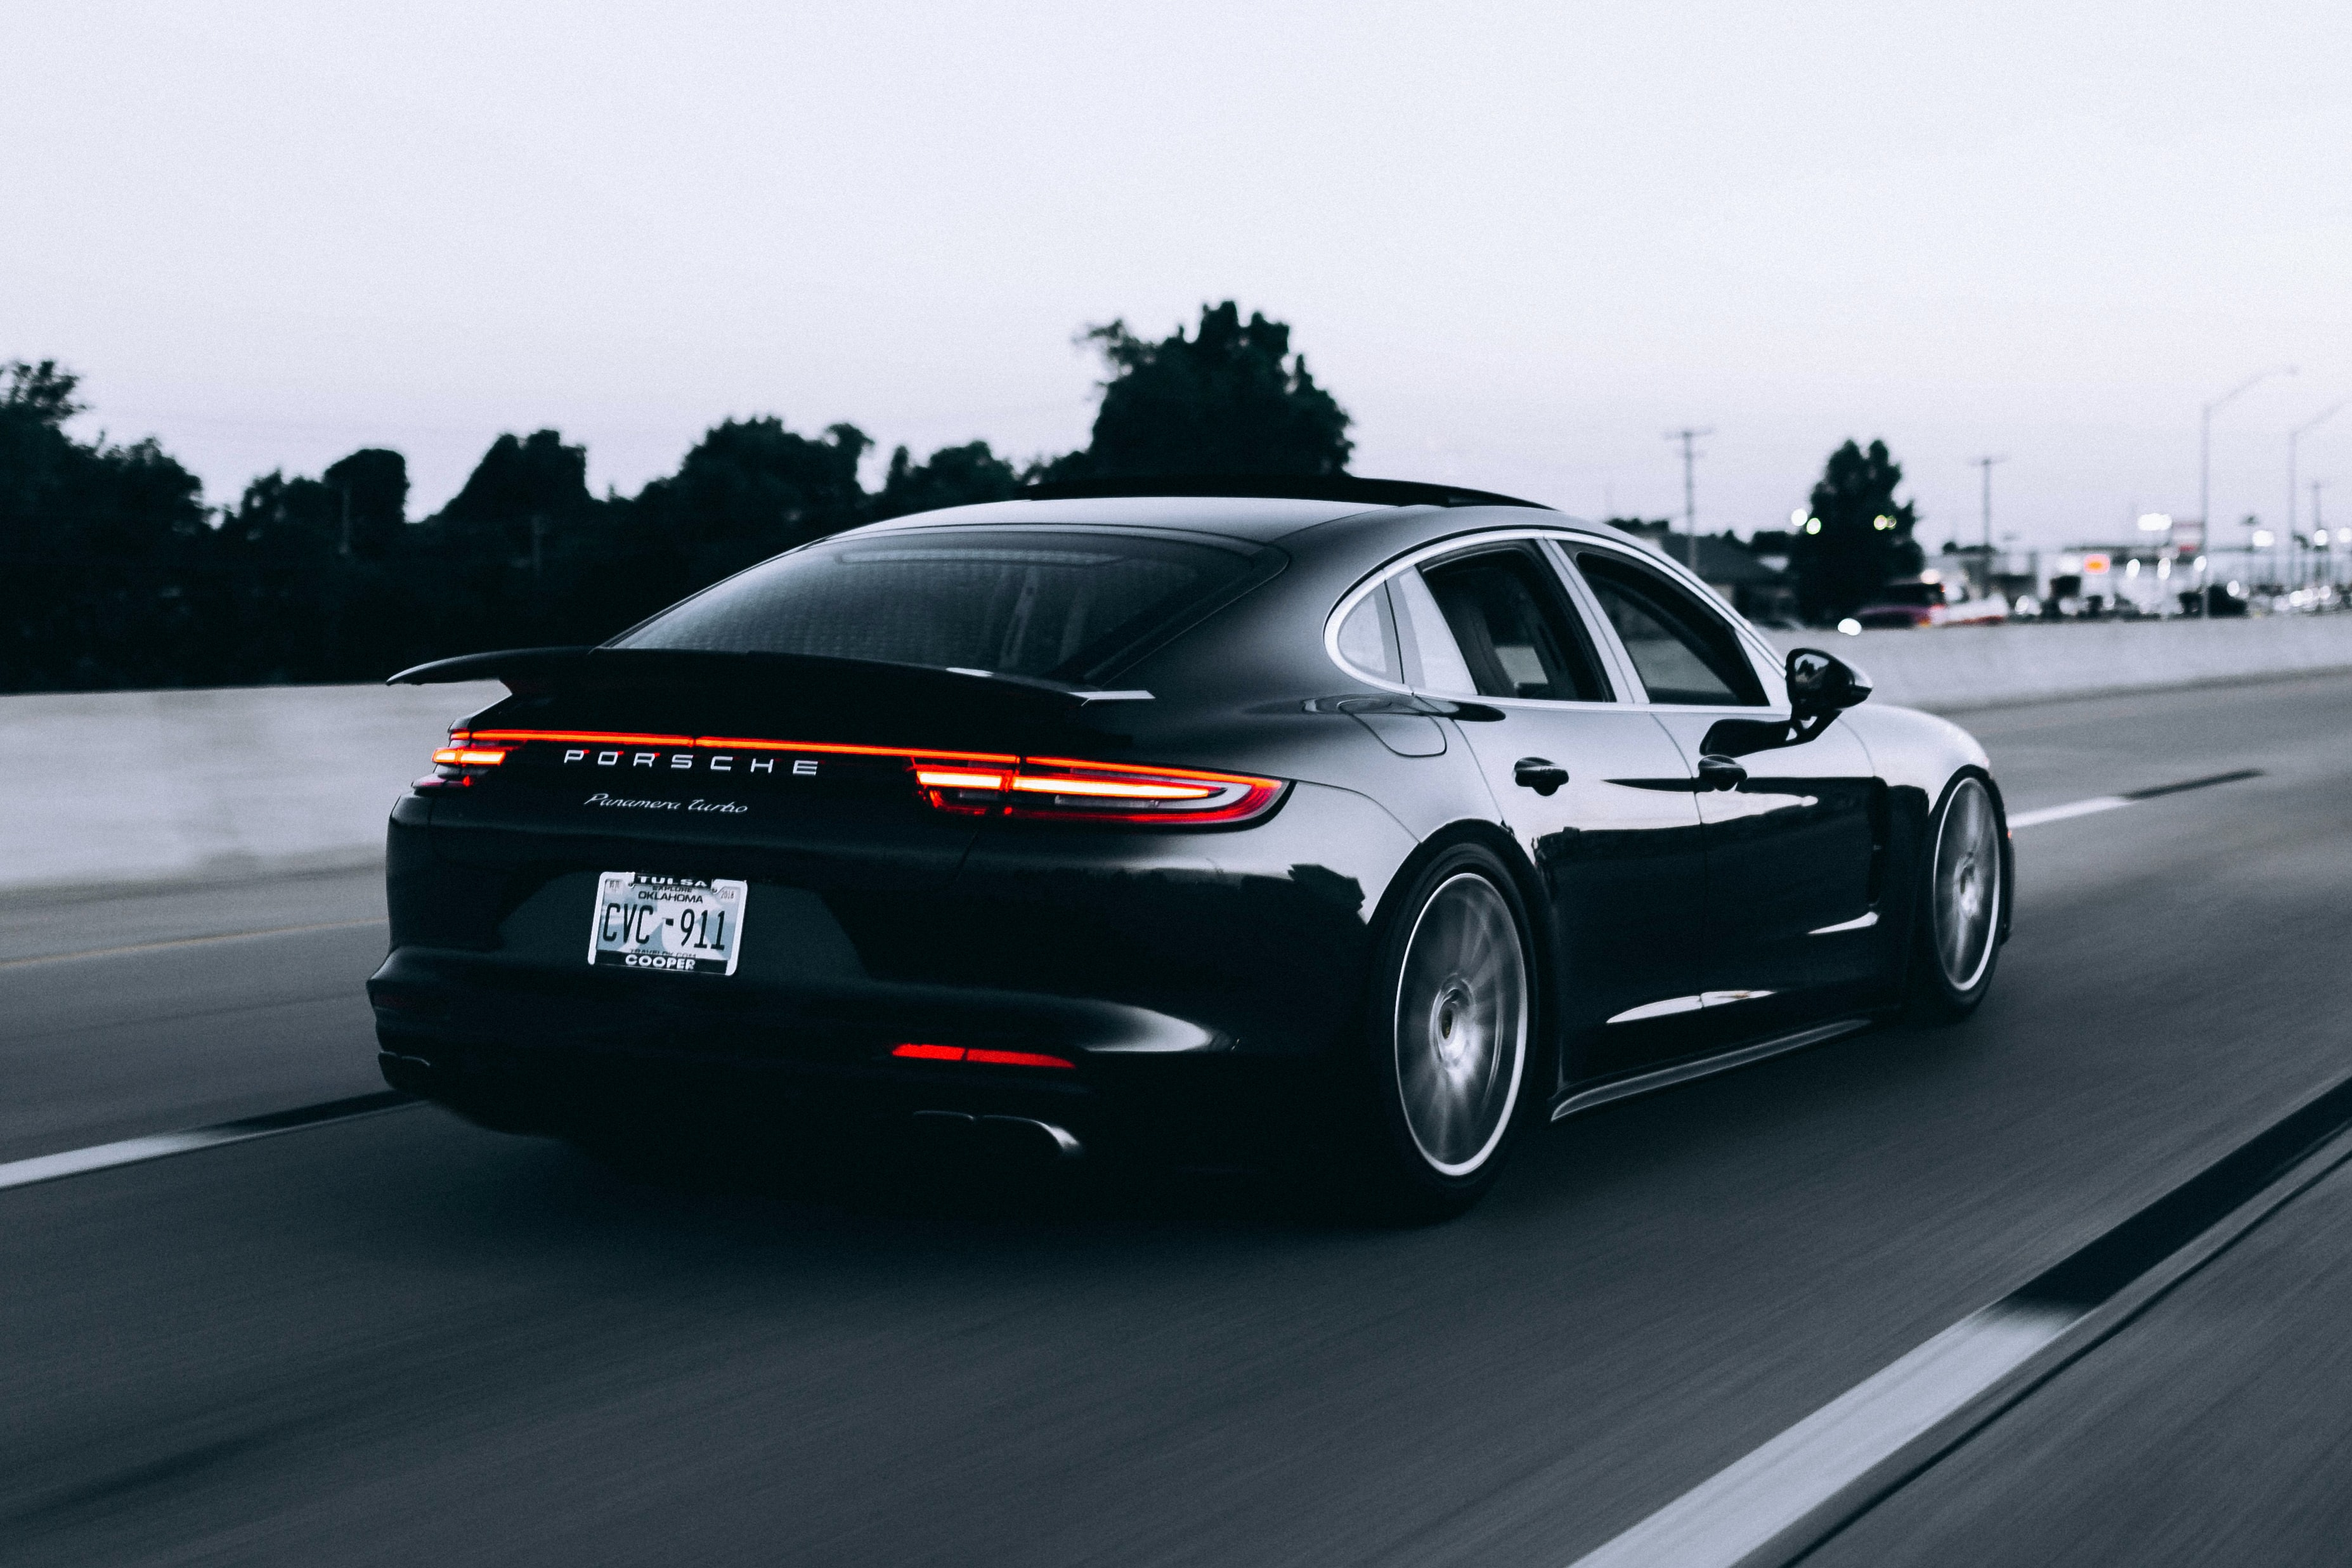 Black Porsche Panamena Turbo On The Road